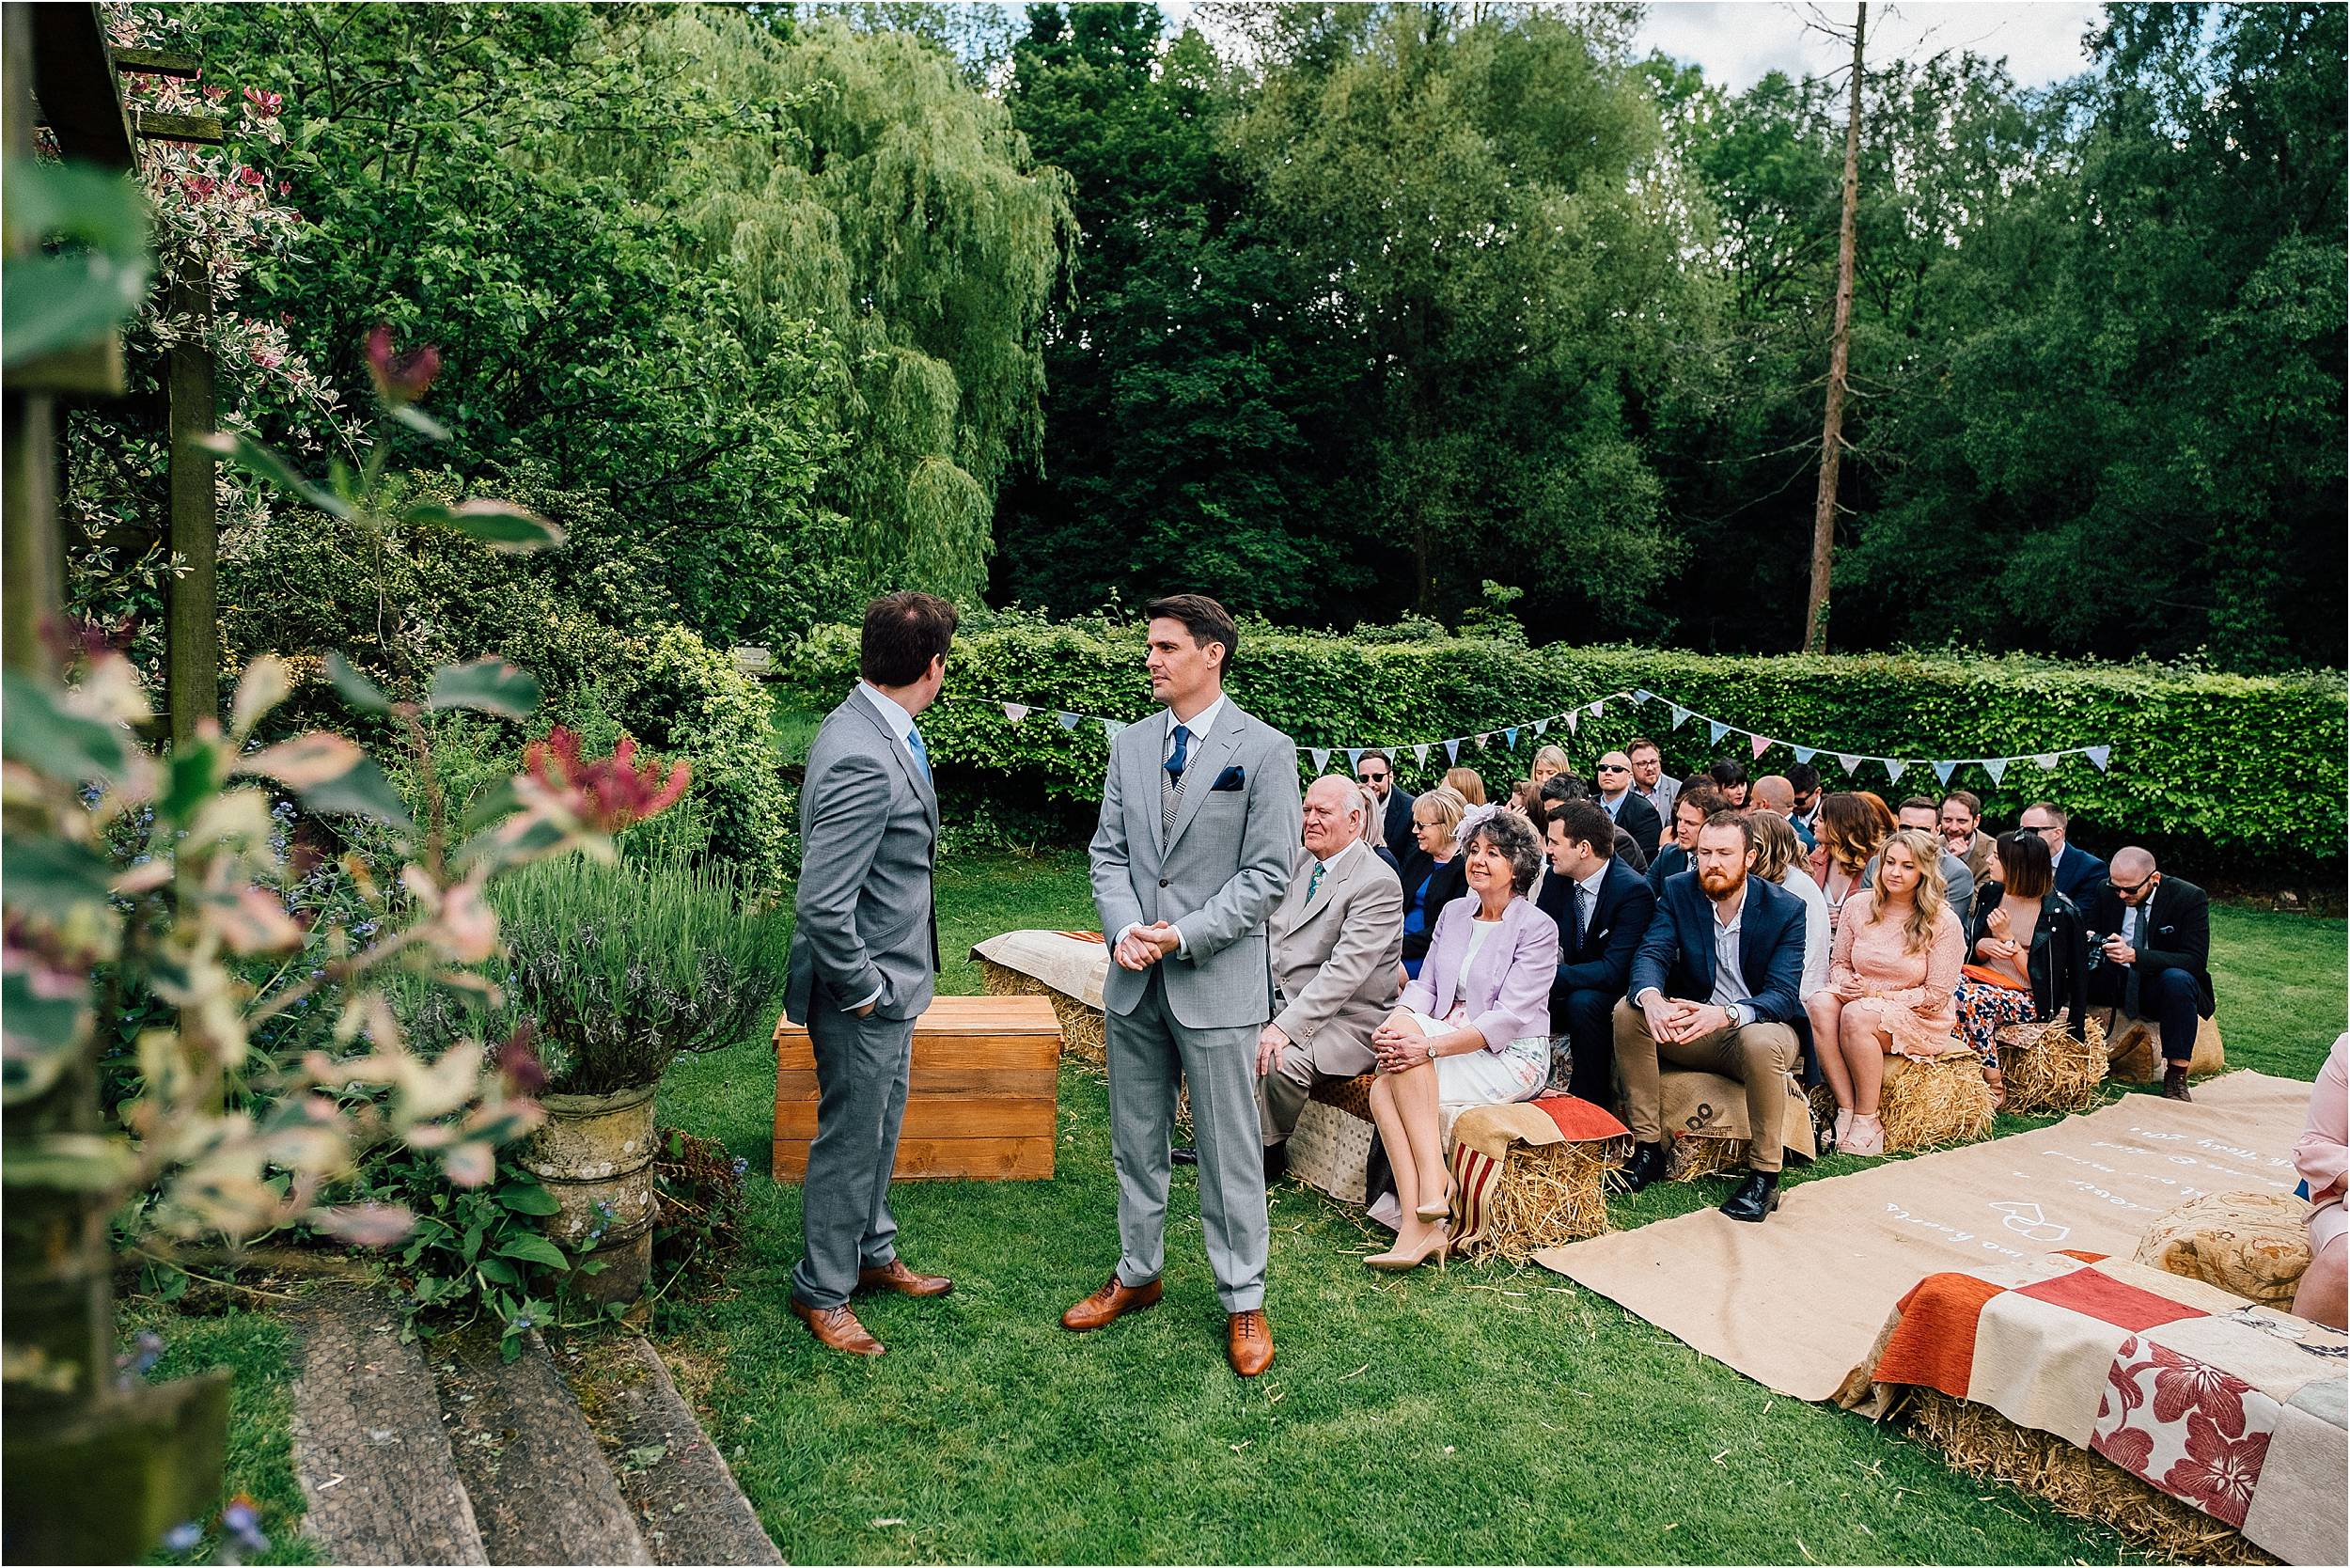 Surrey Hookhouse Farm Wedding Photographer_0030.jpg